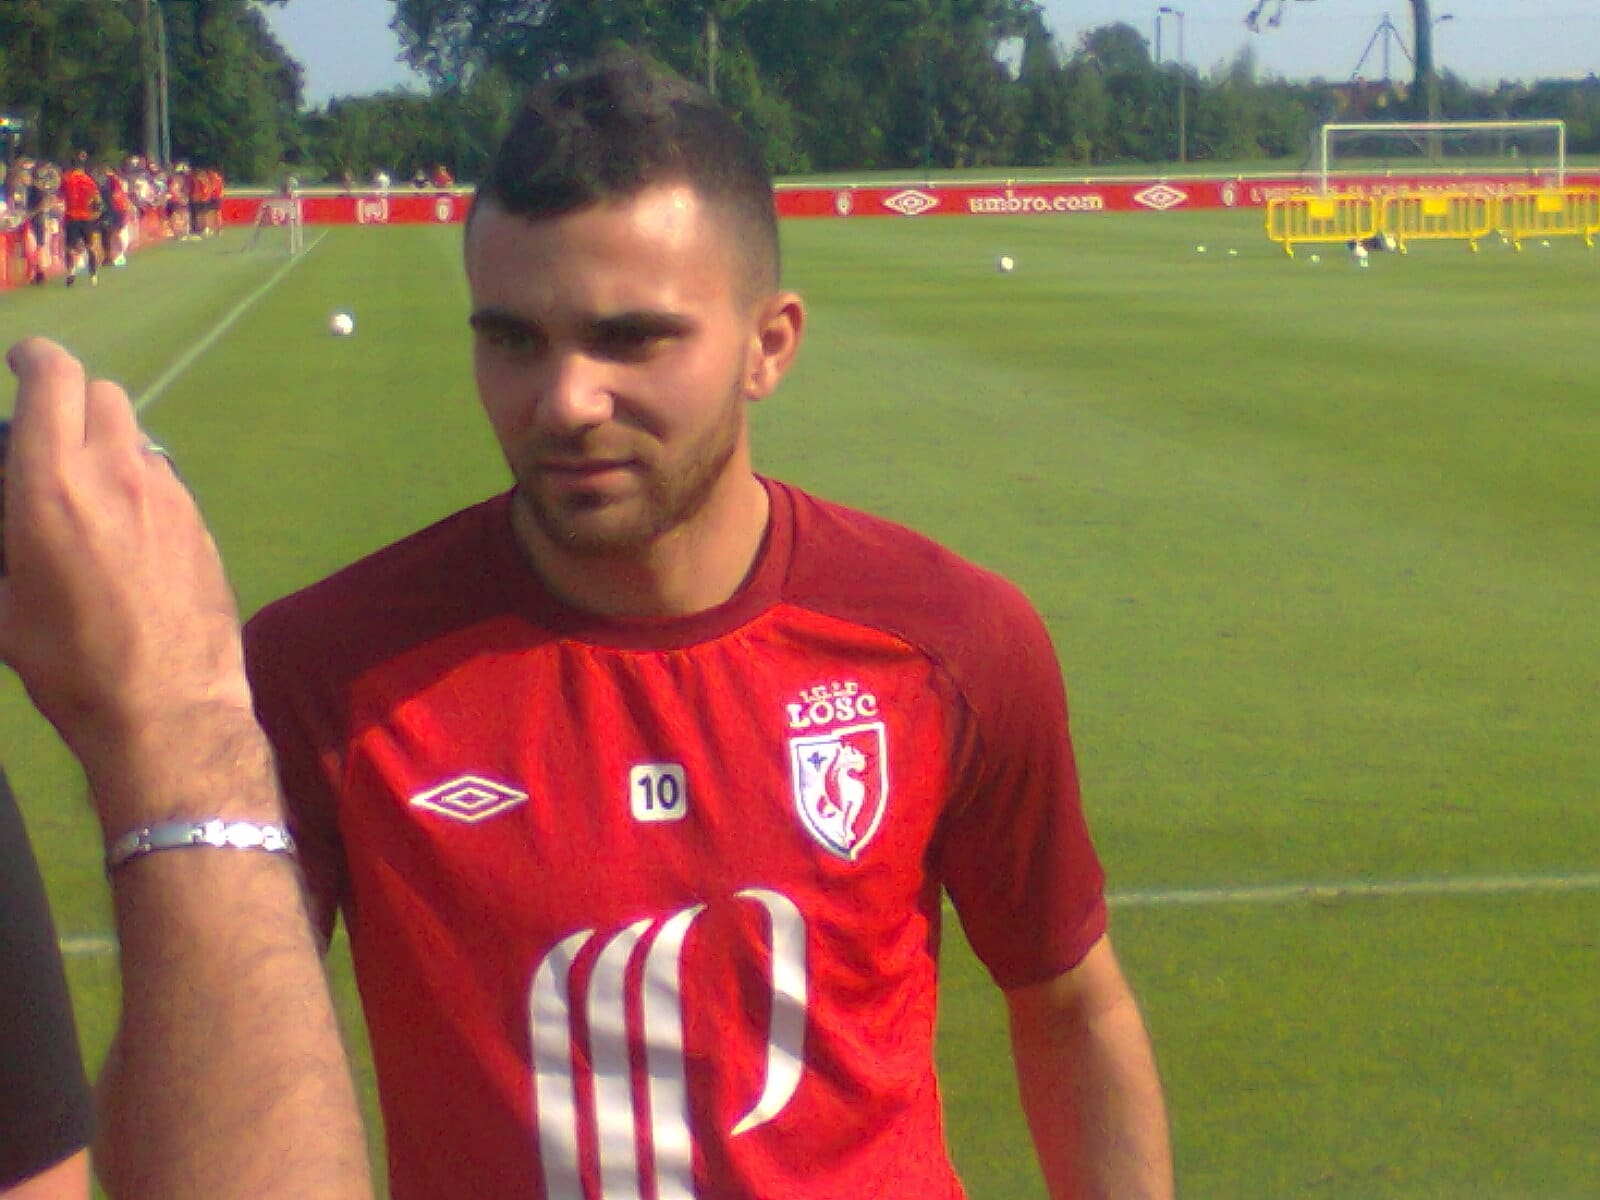 Marvin Martin – joueur de foot (Dijon FC)